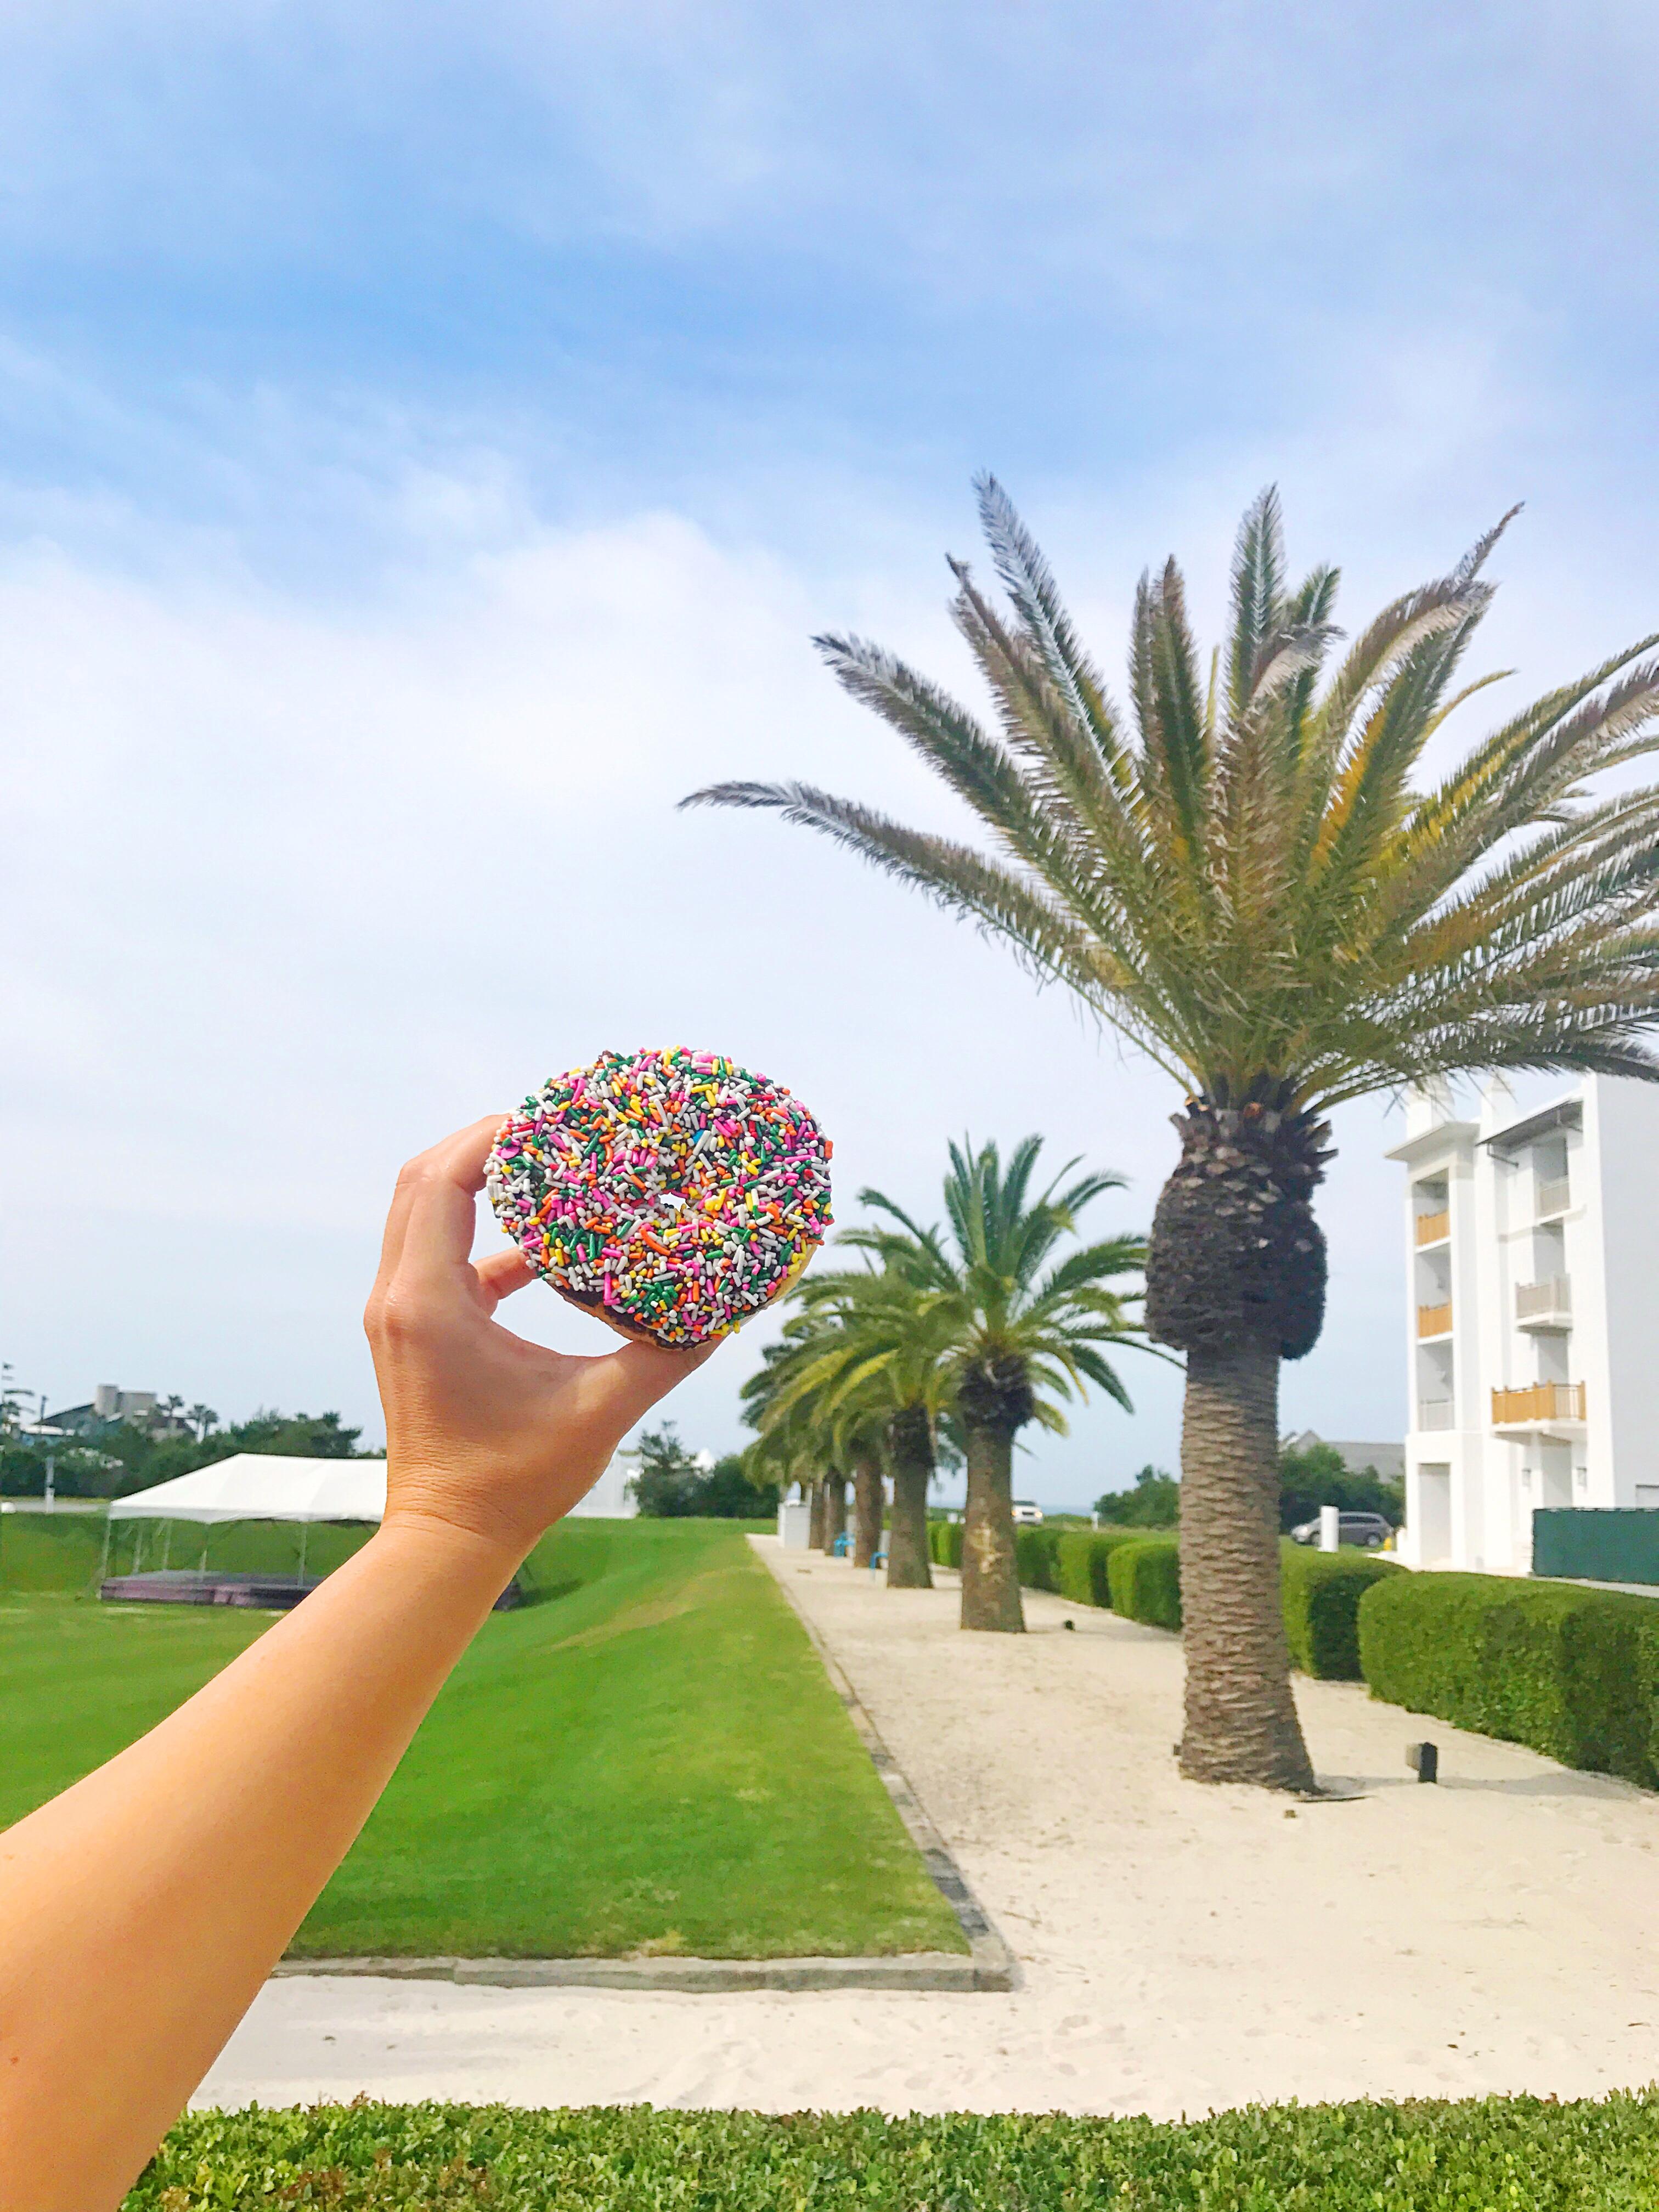 Alys Beach - Charlie's Donuts - 30A Blogger Vacay